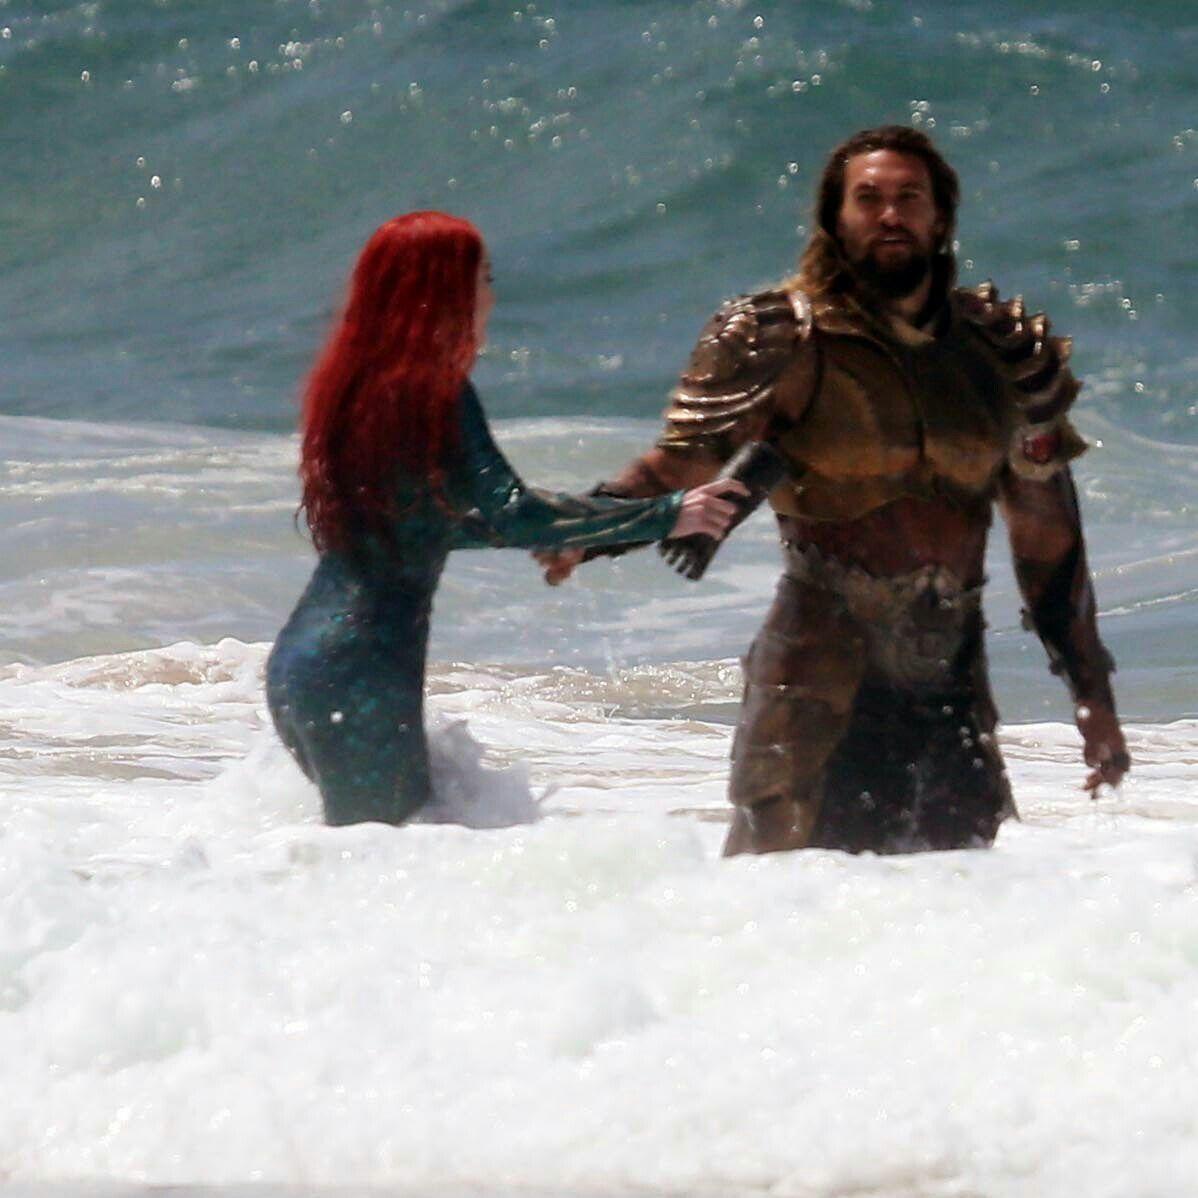 Amber Heard And Jason Momoa Photos Photos: Amber Heard And Jason Momoa As Mera & Aquaman Filming